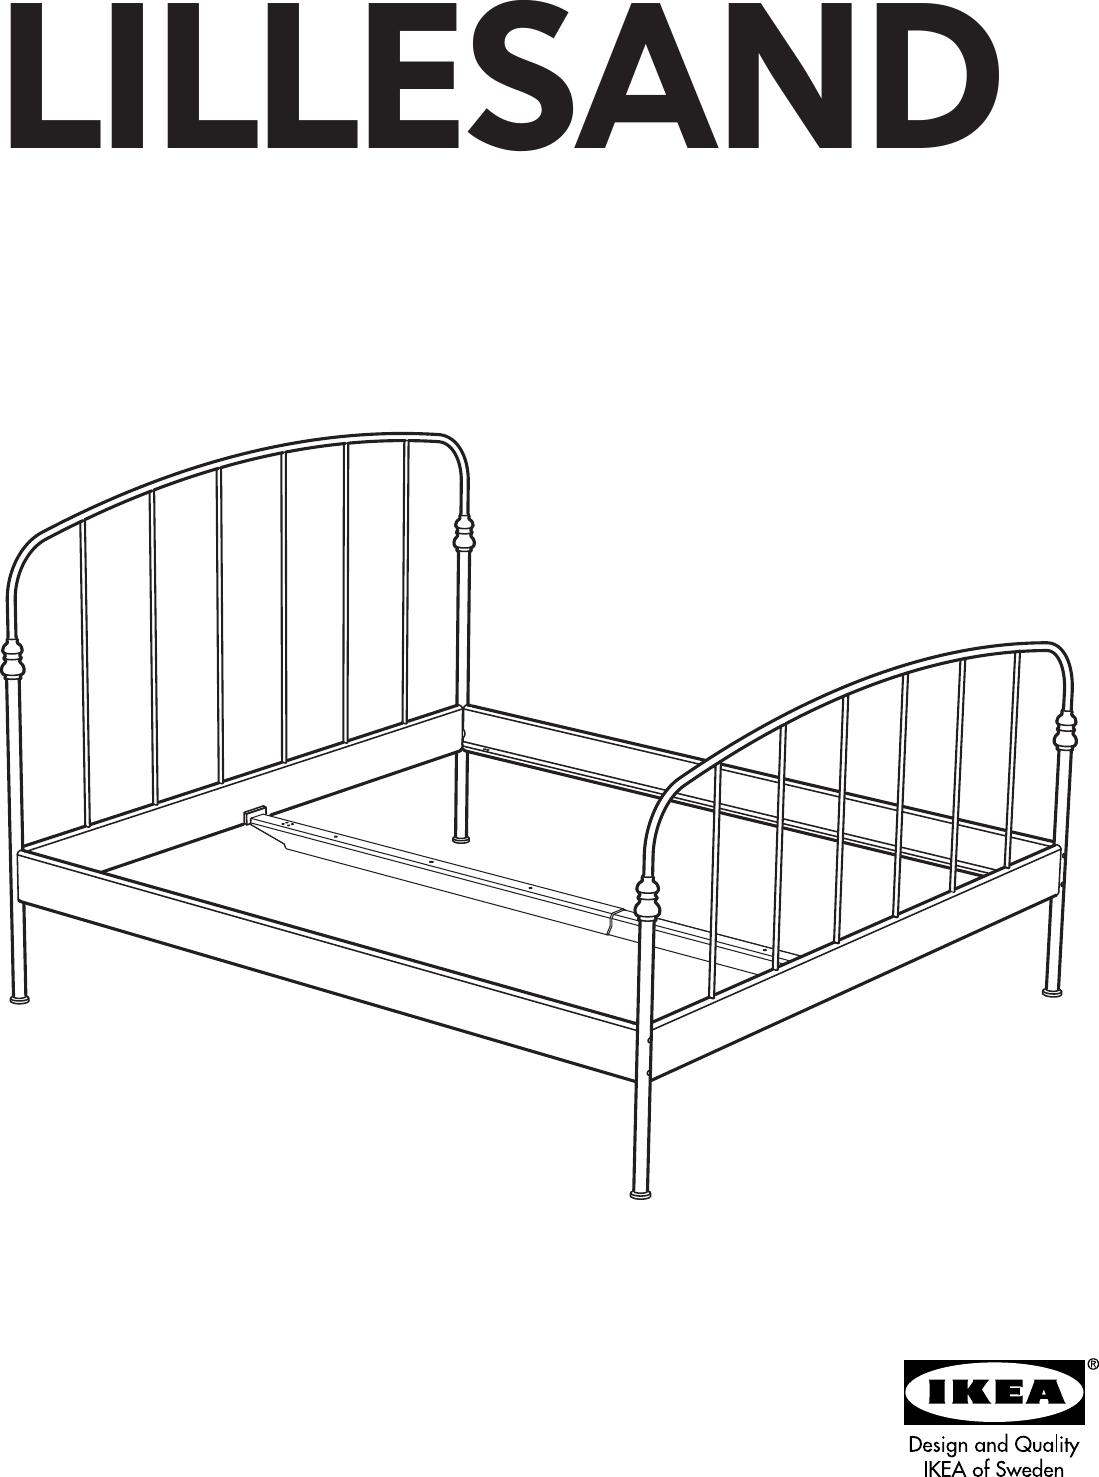 ikea malm single bed assembly instructions